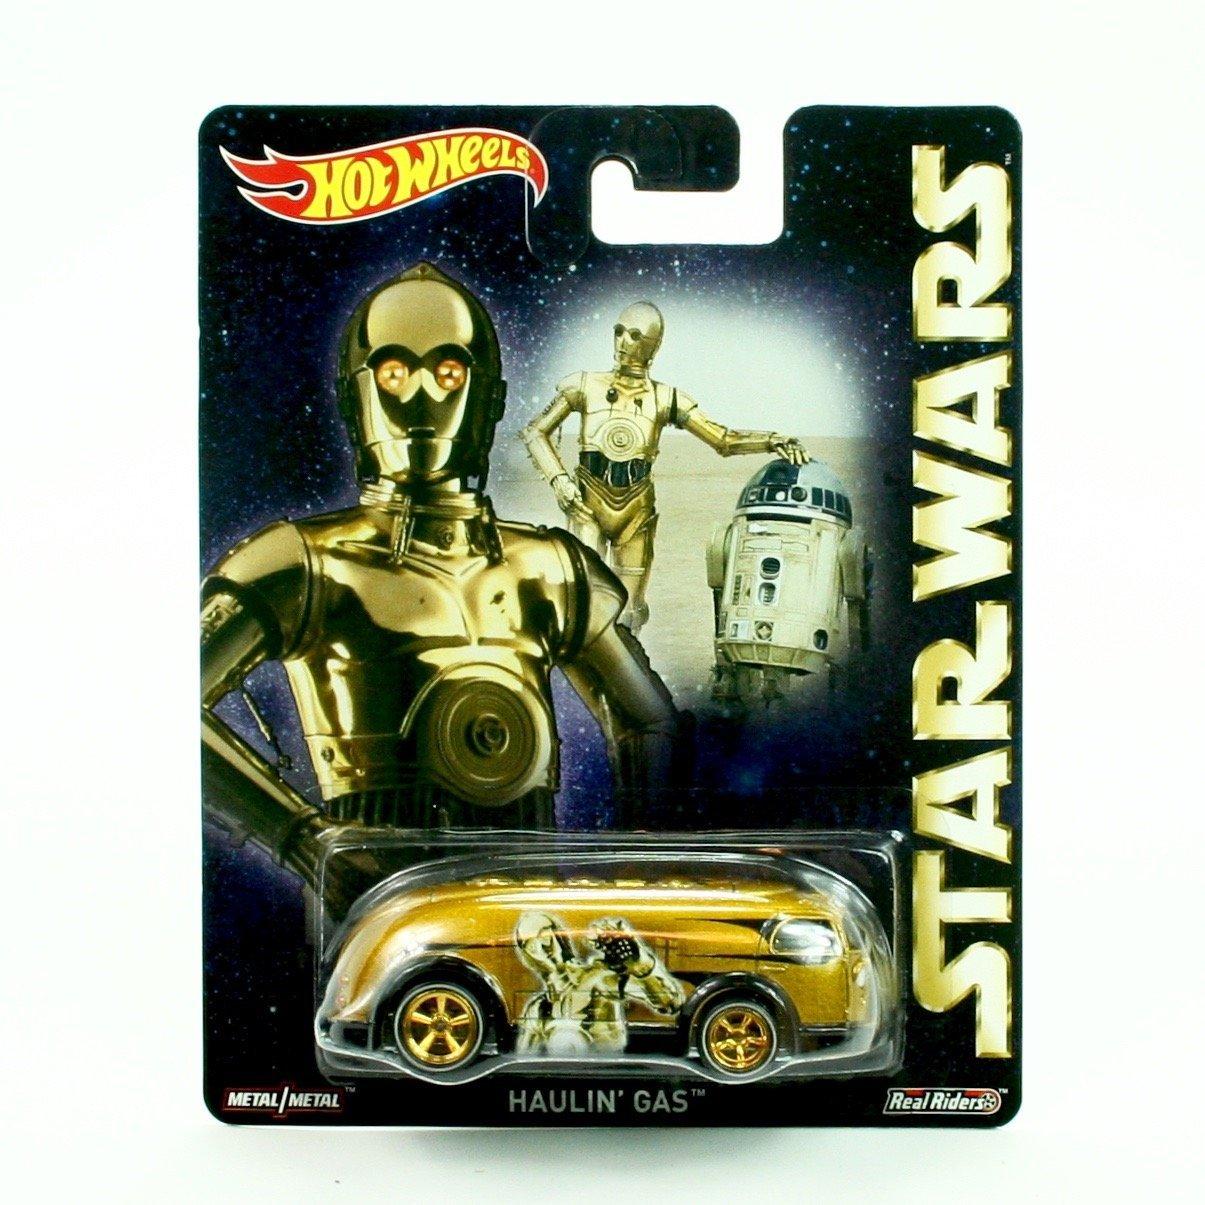 HAULIN' GAS * C-3PO * Hot Wheels 2015 Pop Culture STAR WARS Series Die-Cast Vehicle